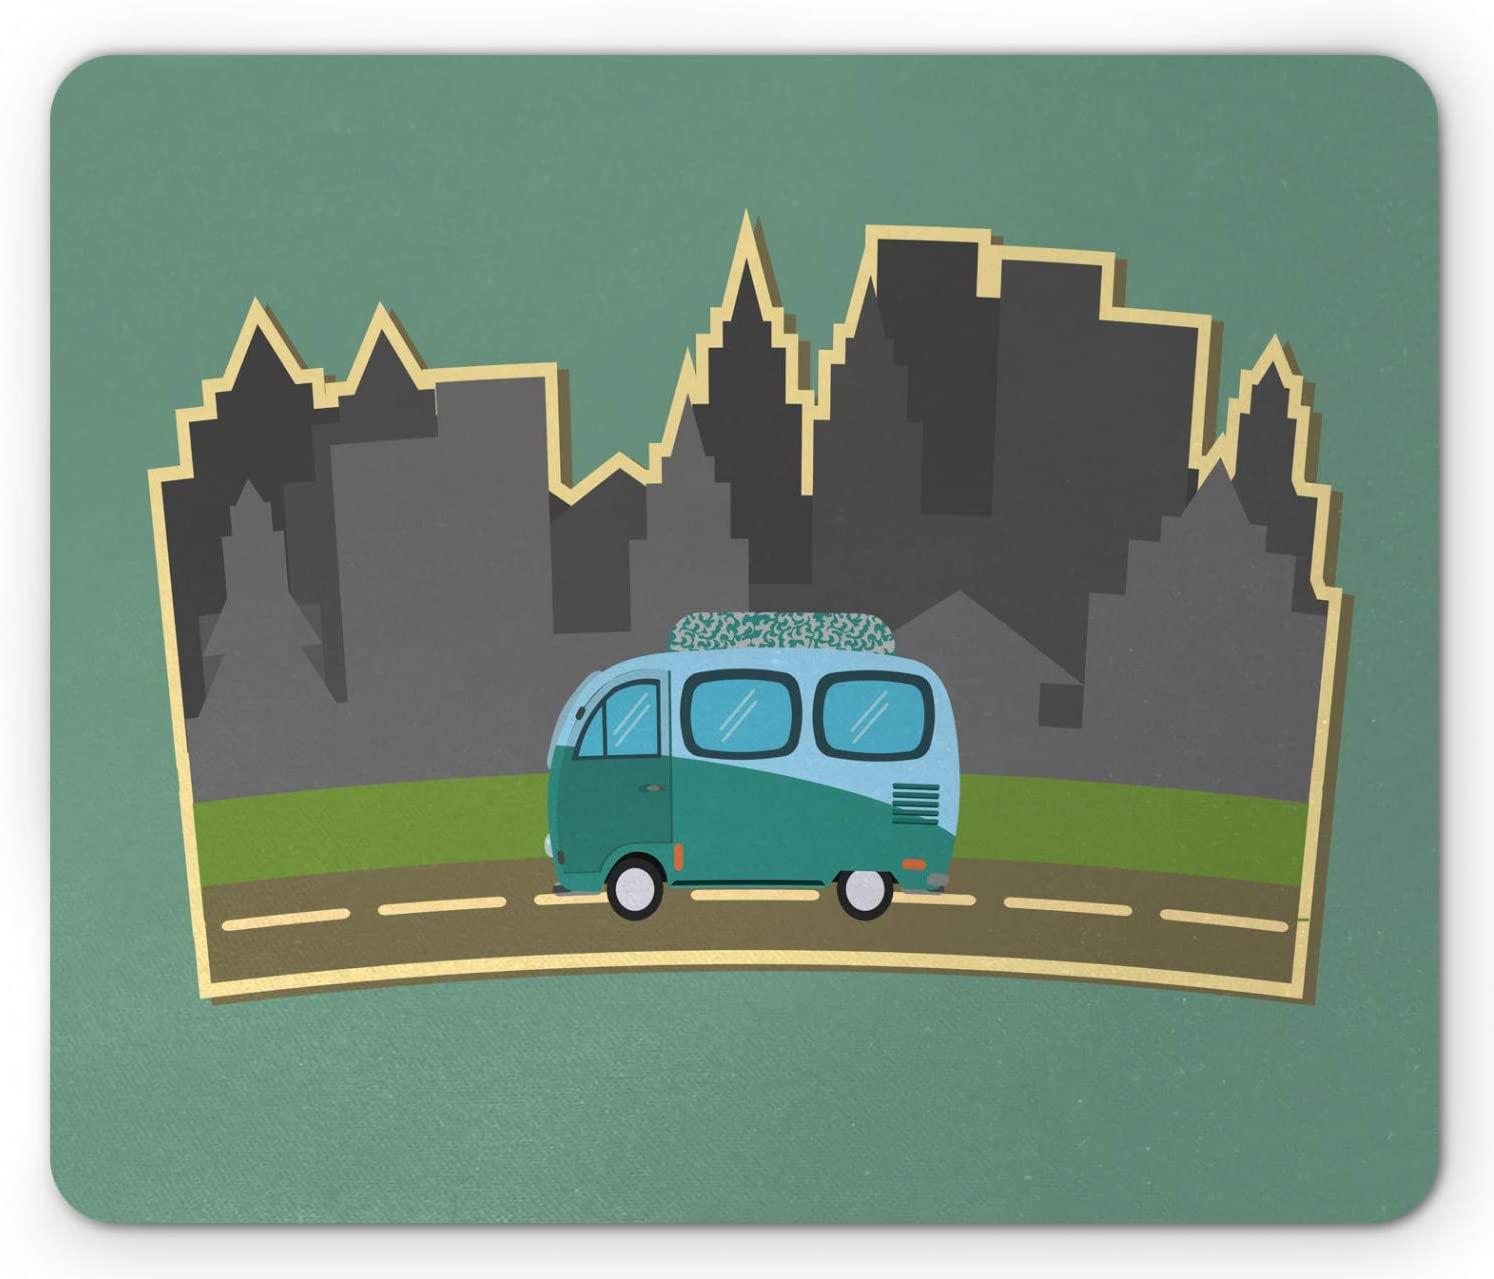 Lunarable Adventure Mouse Pad, Adventure Driving Along The City Buildings Silhouette Illustration, Rectangle Non-Slip Rubber Mousepad, Standard Size, Laurel Green Multicolor